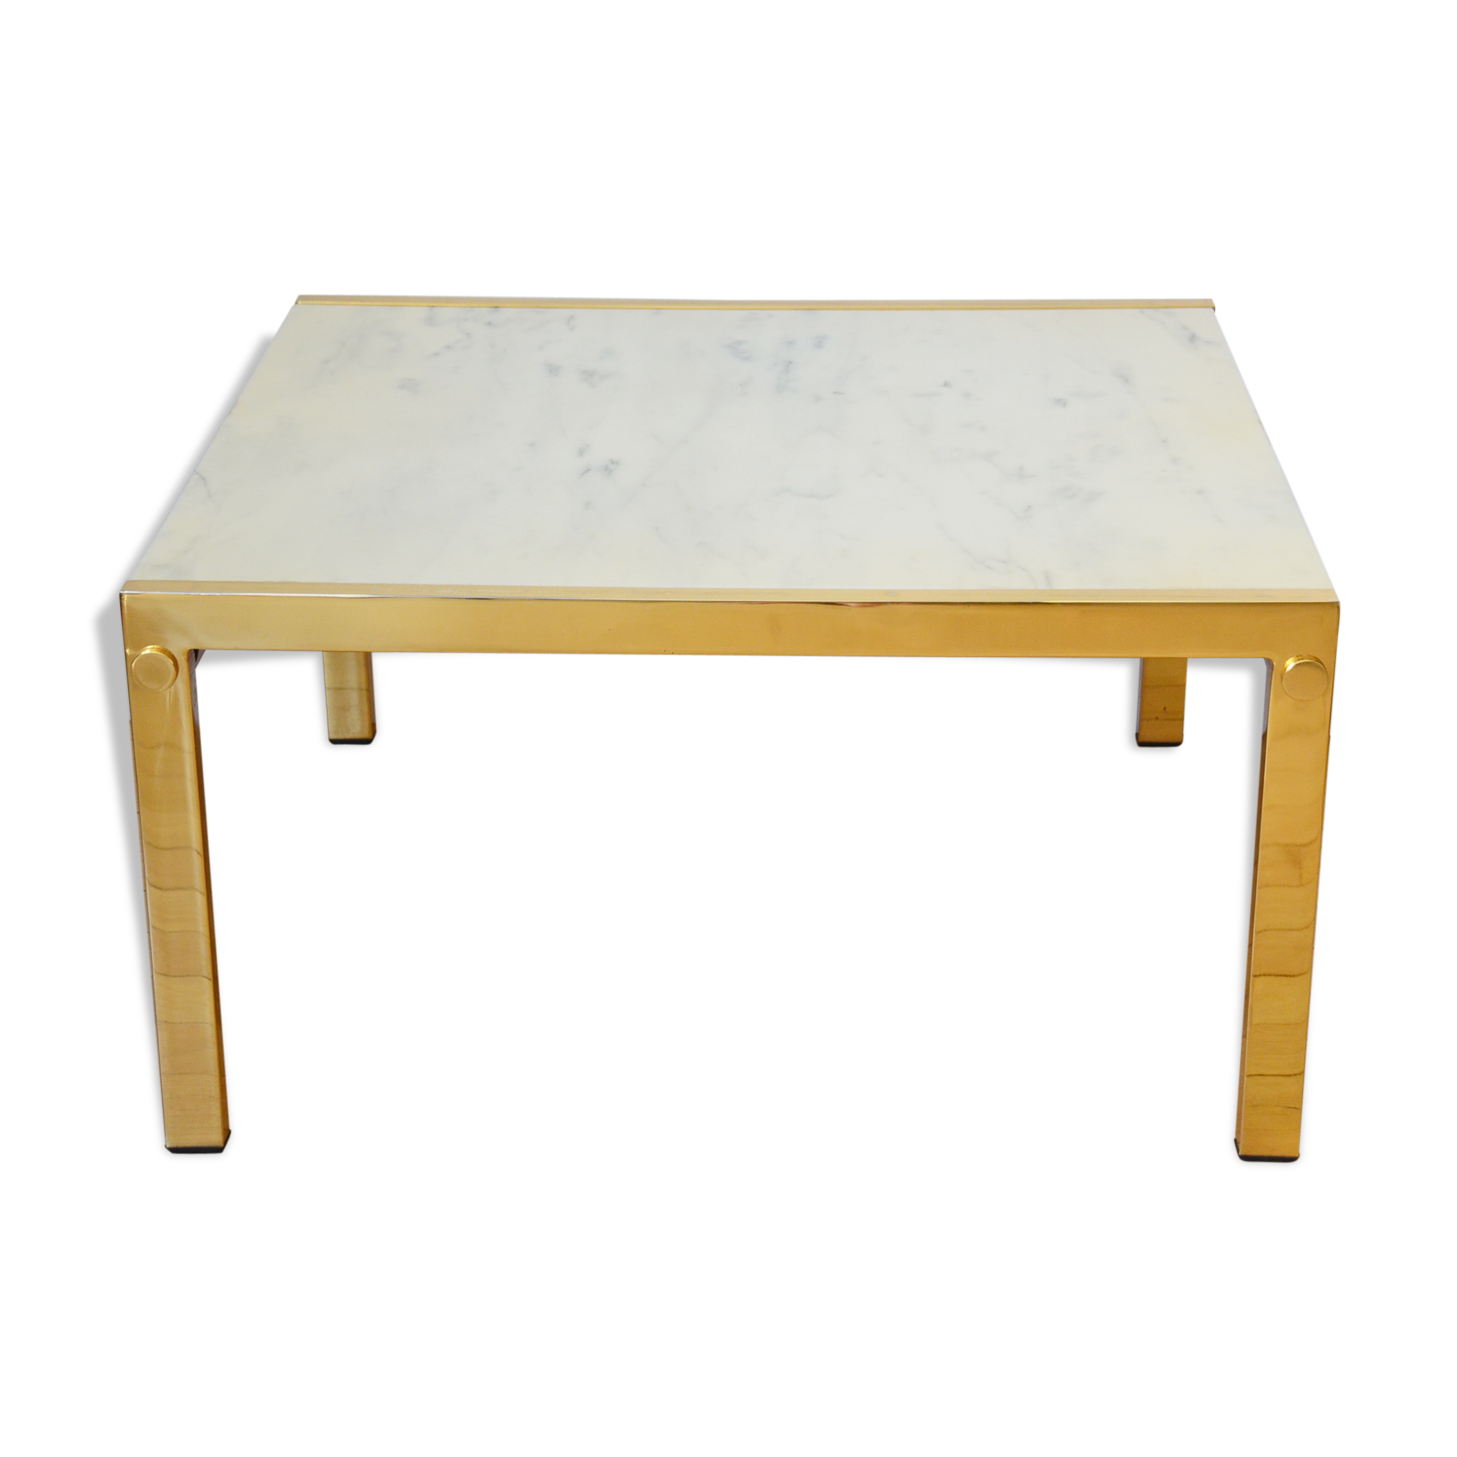 stunning table ardoise roche bobois ideas amazing house. Black Bedroom Furniture Sets. Home Design Ideas